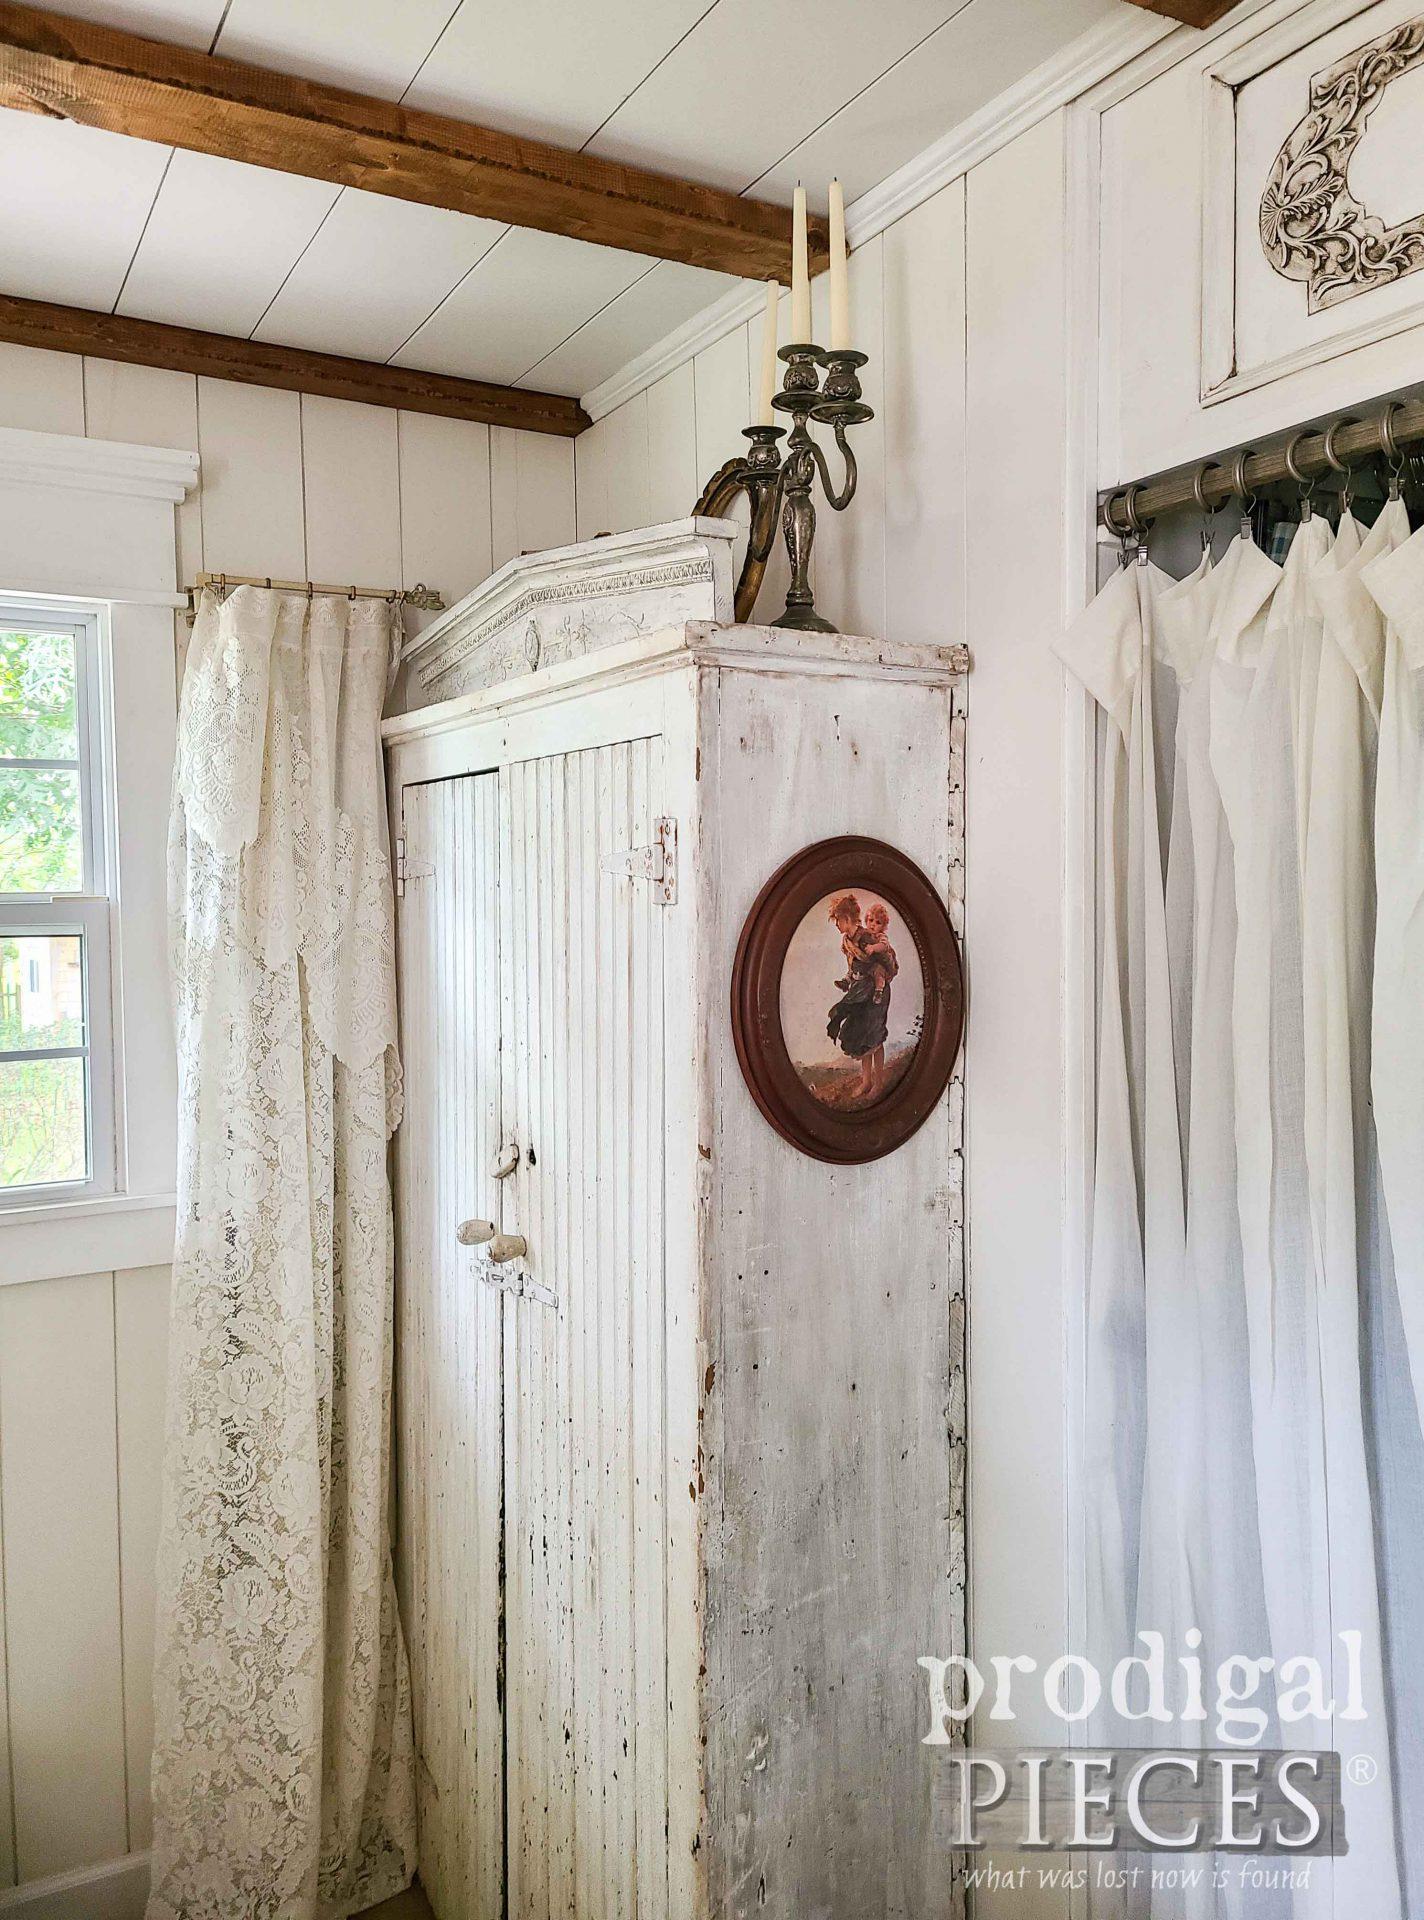 Antique Farmhouse Cupboard with Pediment by Larissa of Prodigal Pieces | prodigalpieces.com #prodigalpieces #famhouse #antique #diy #home